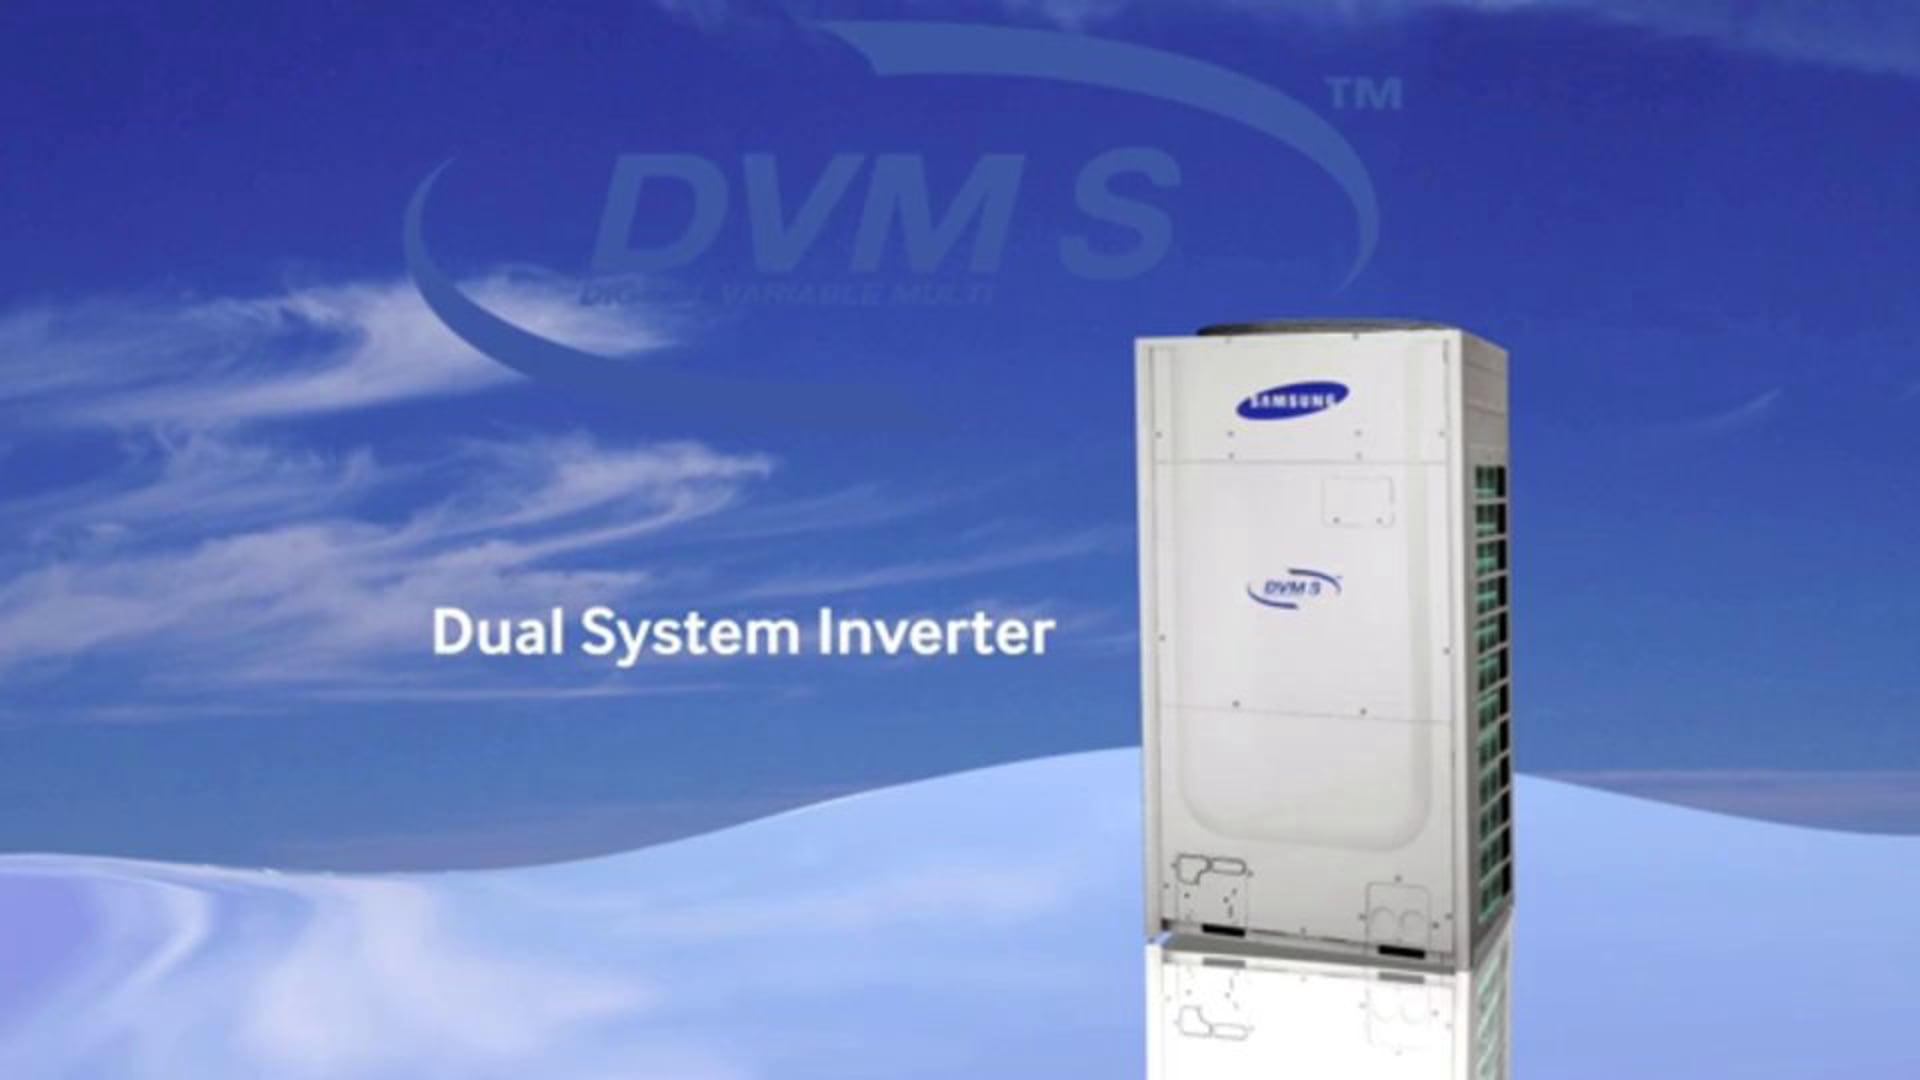 Samsung DVM S - Animation